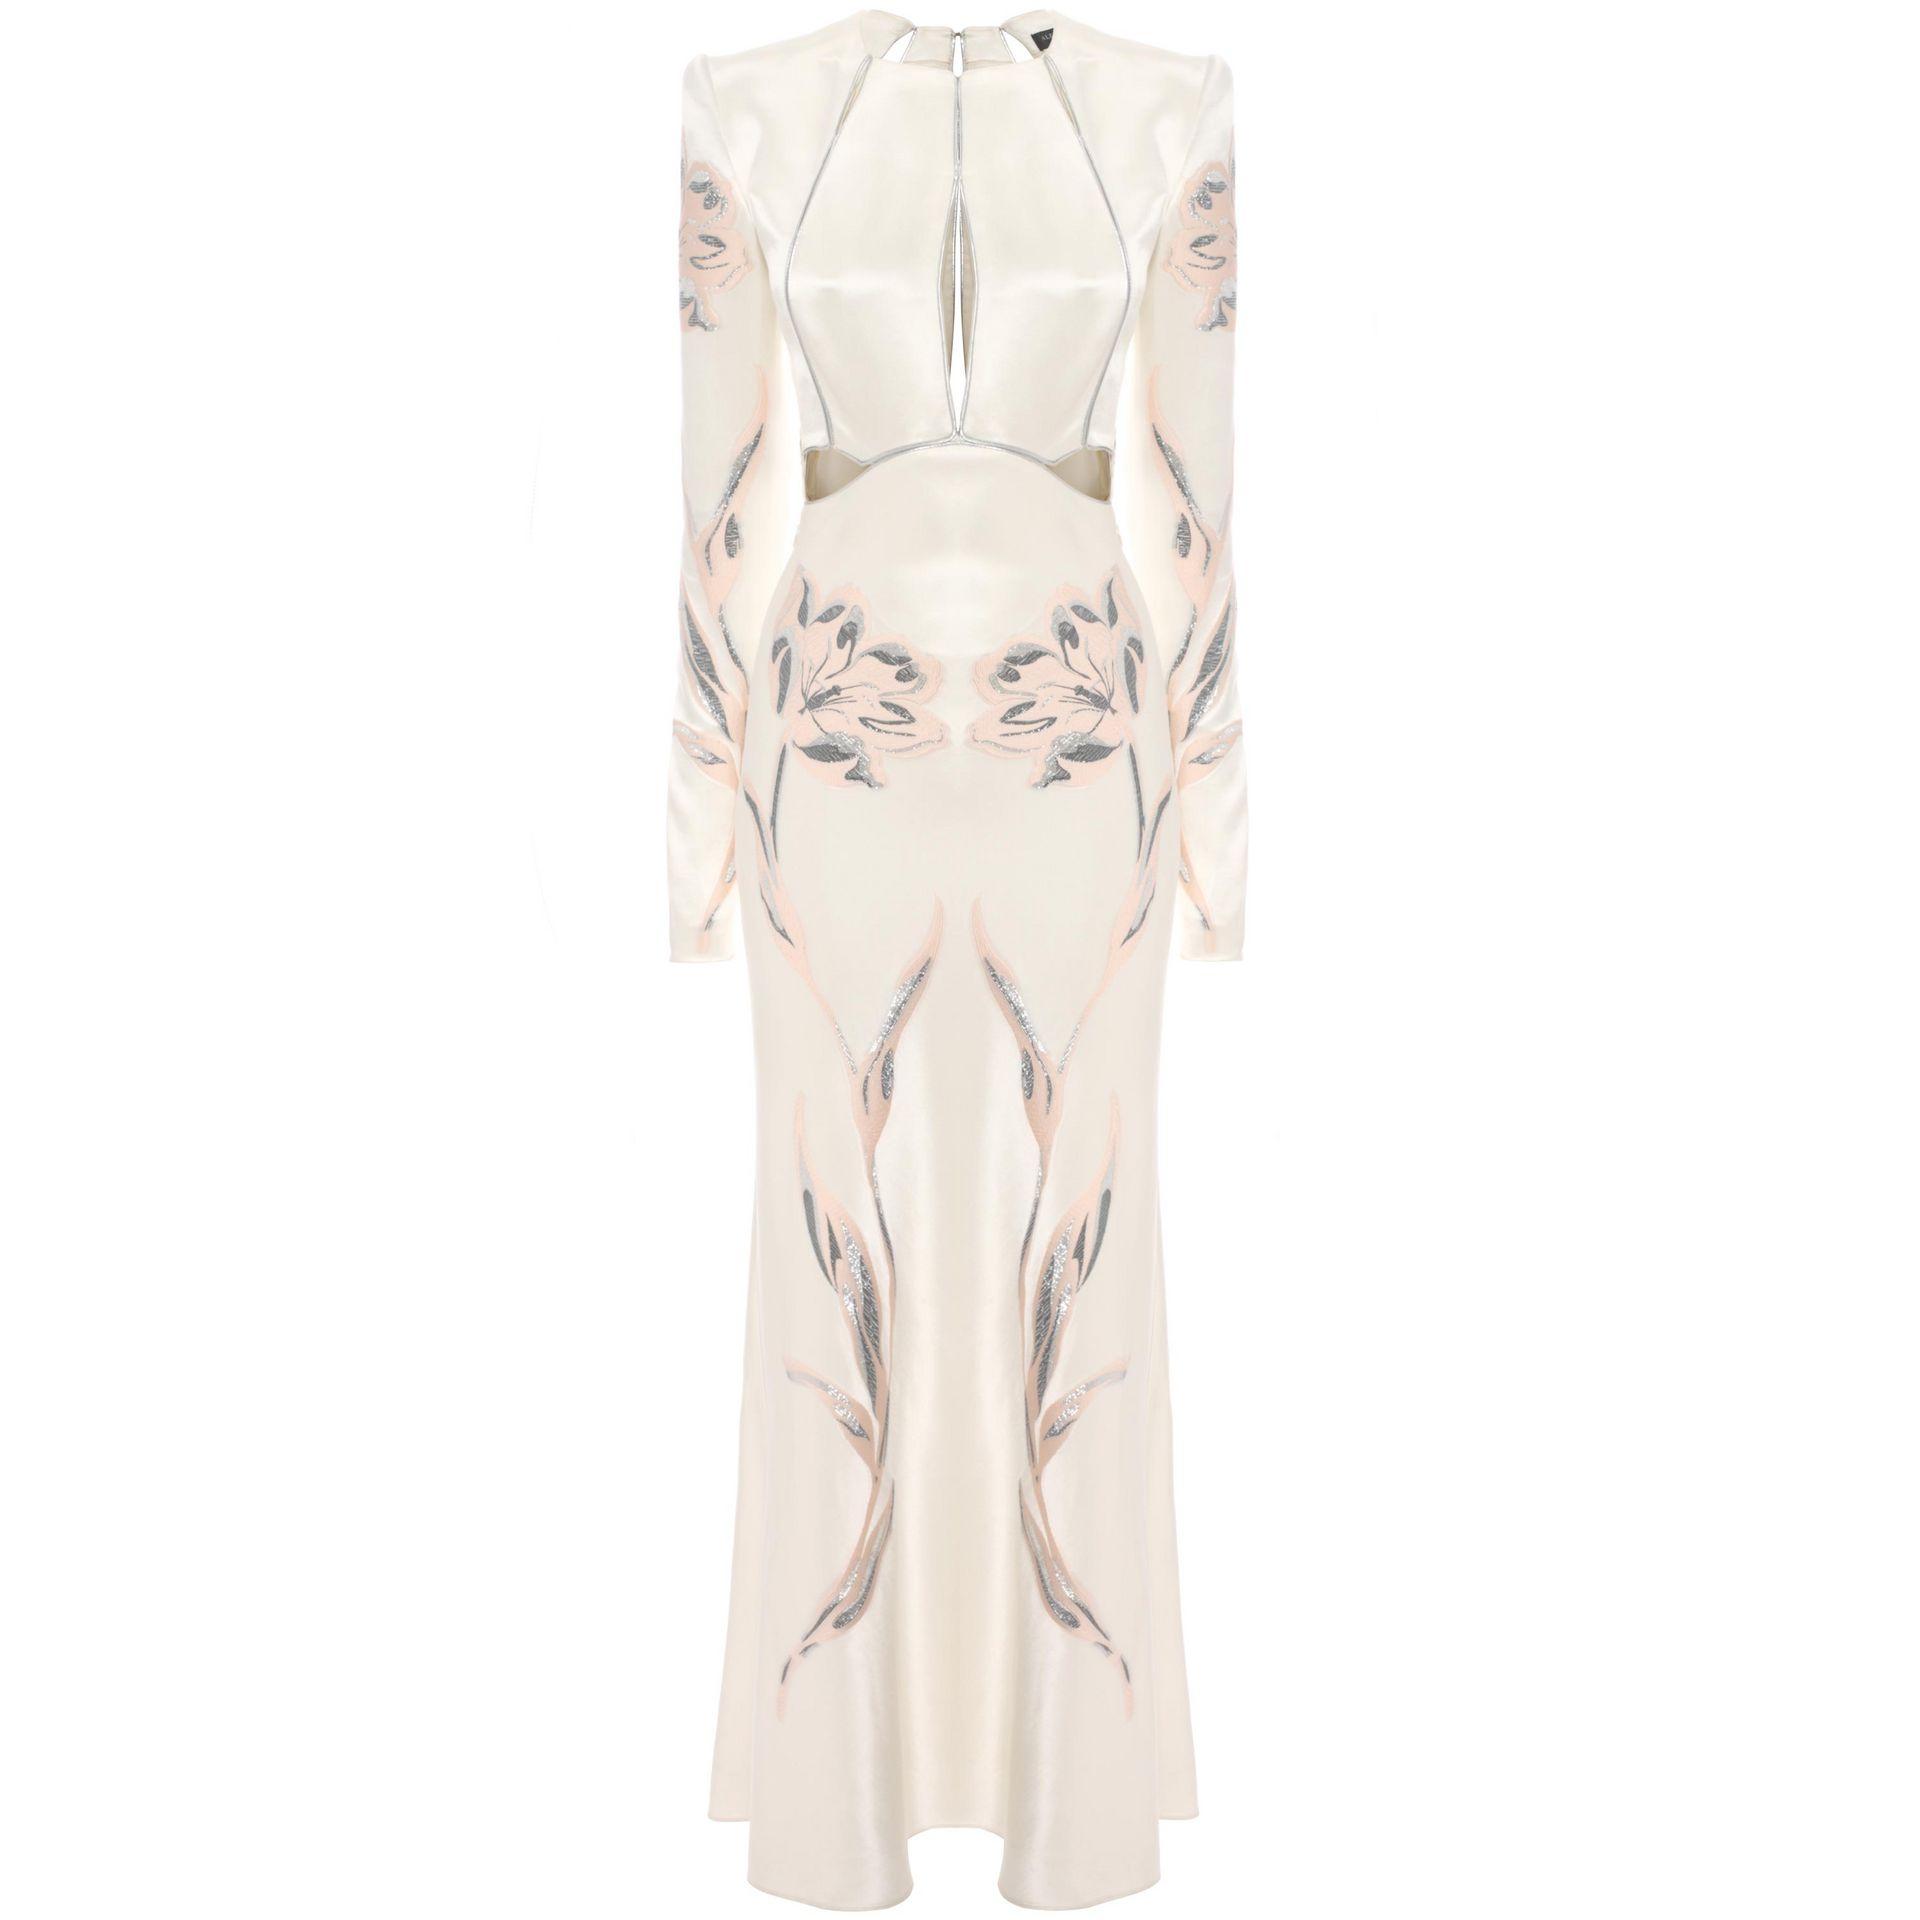 Sarah Bentley Clothing: Alexander McQueen Tulip Jacquard Slash A-Line Dress In